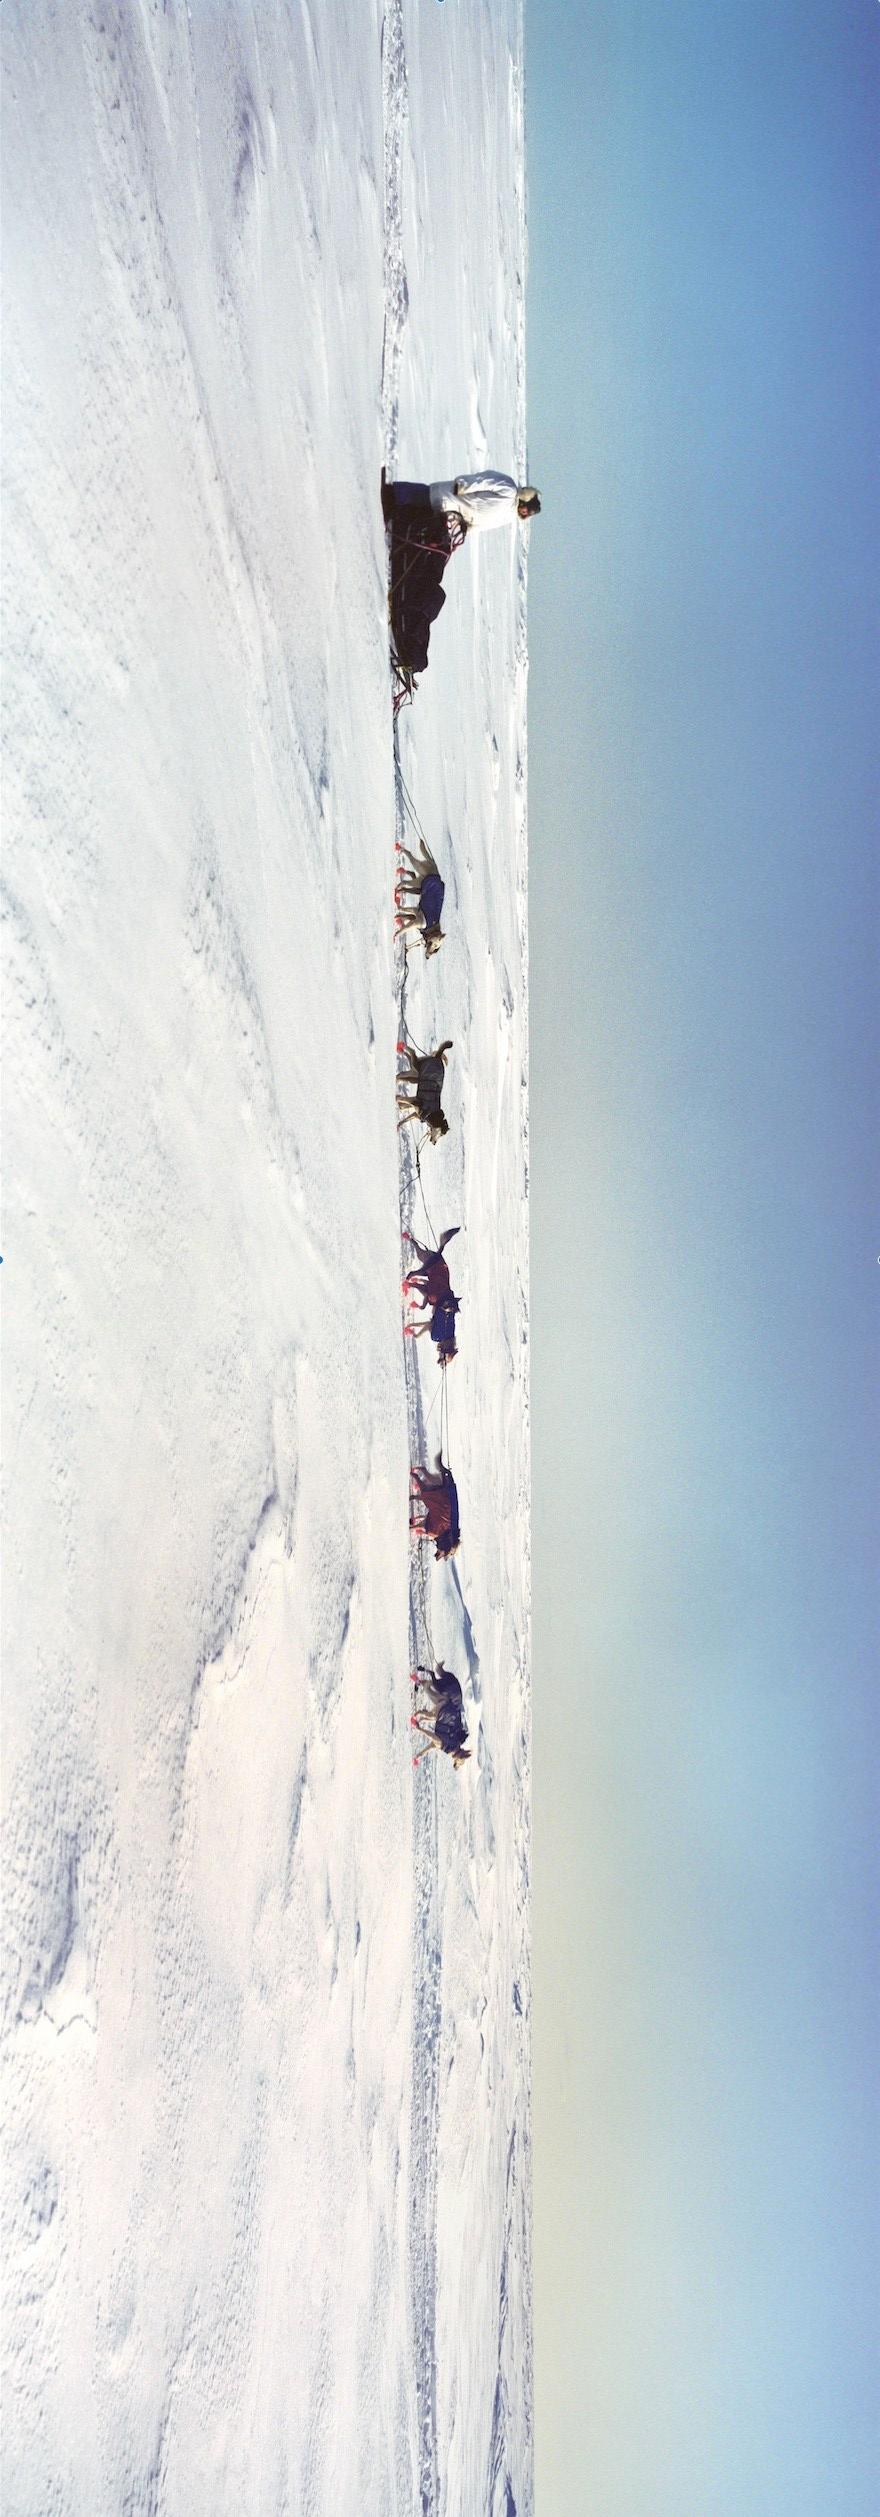 Bering Sea2004